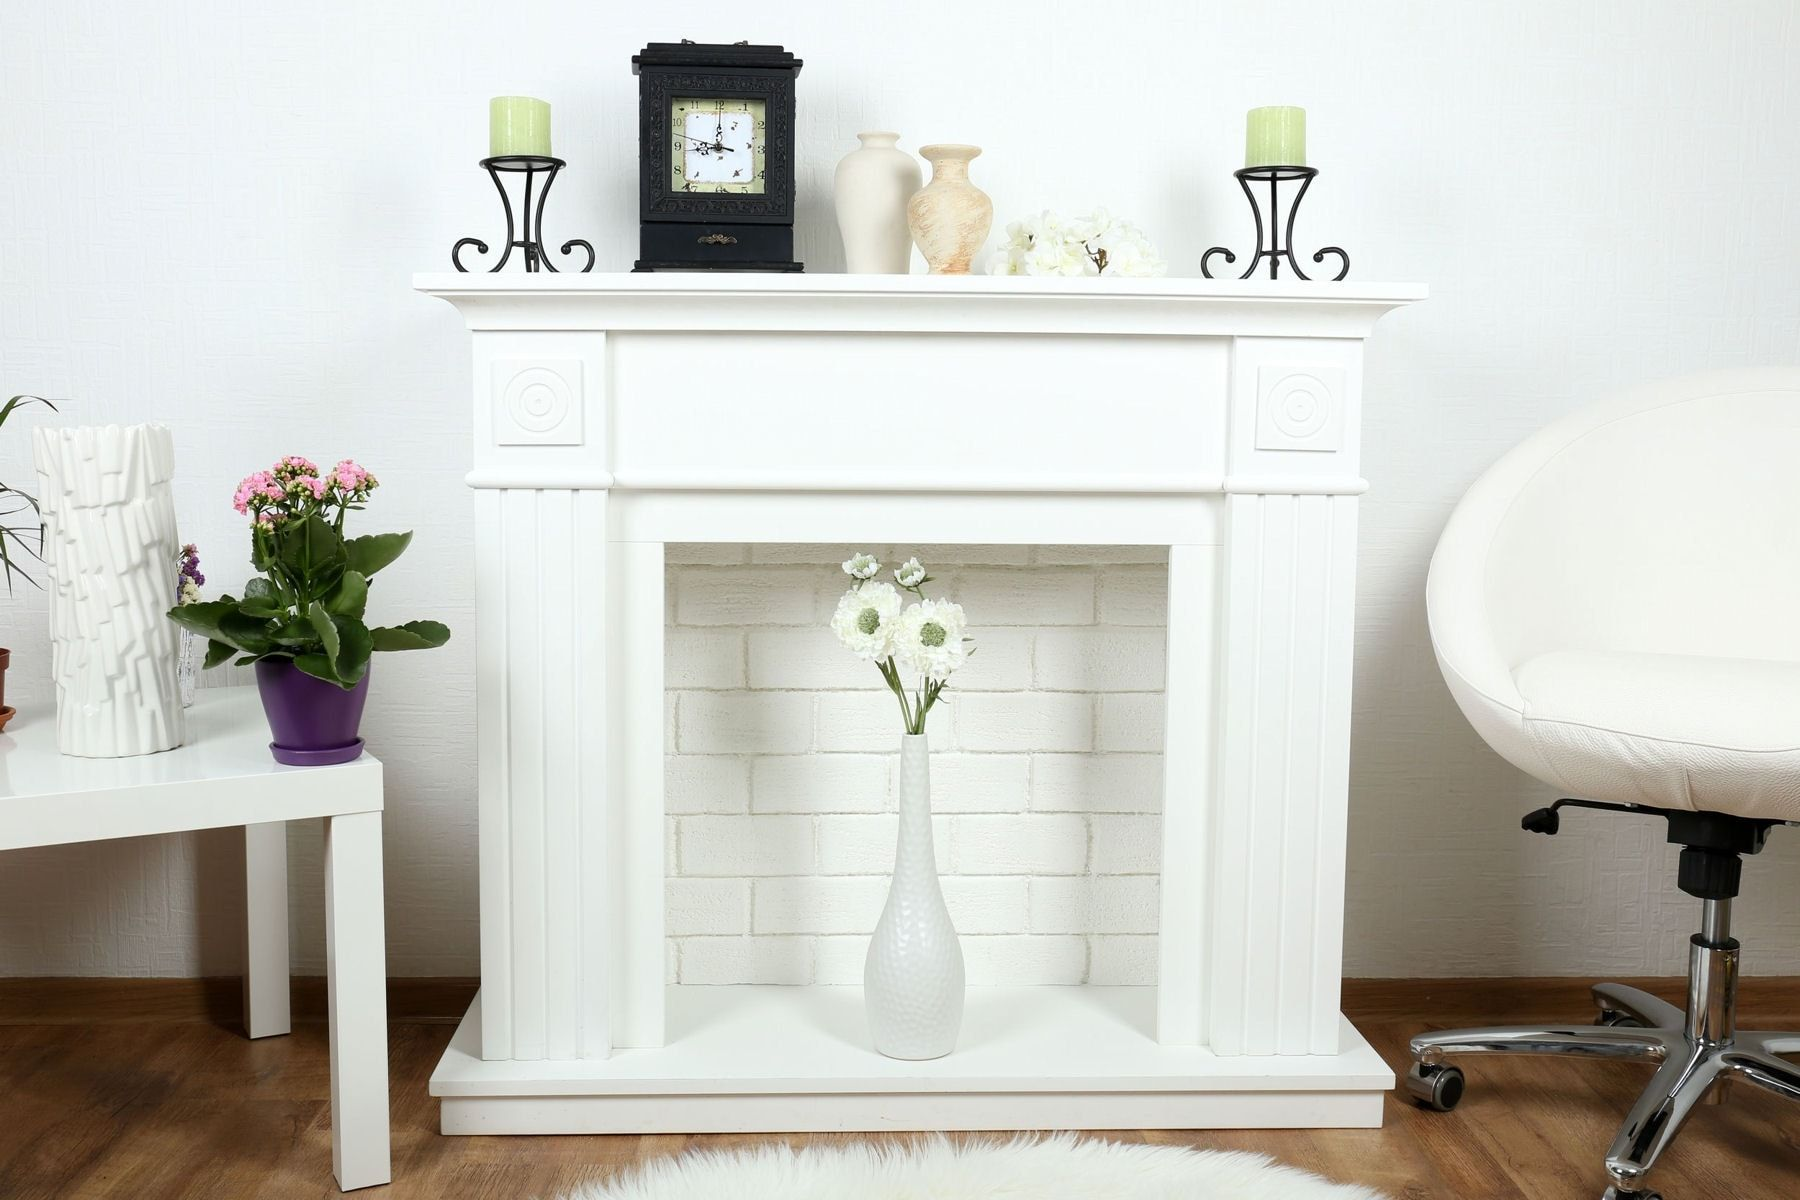 10 fa ons simples de donner du style sa chemin e en 2019. Black Bedroom Furniture Sets. Home Design Ideas